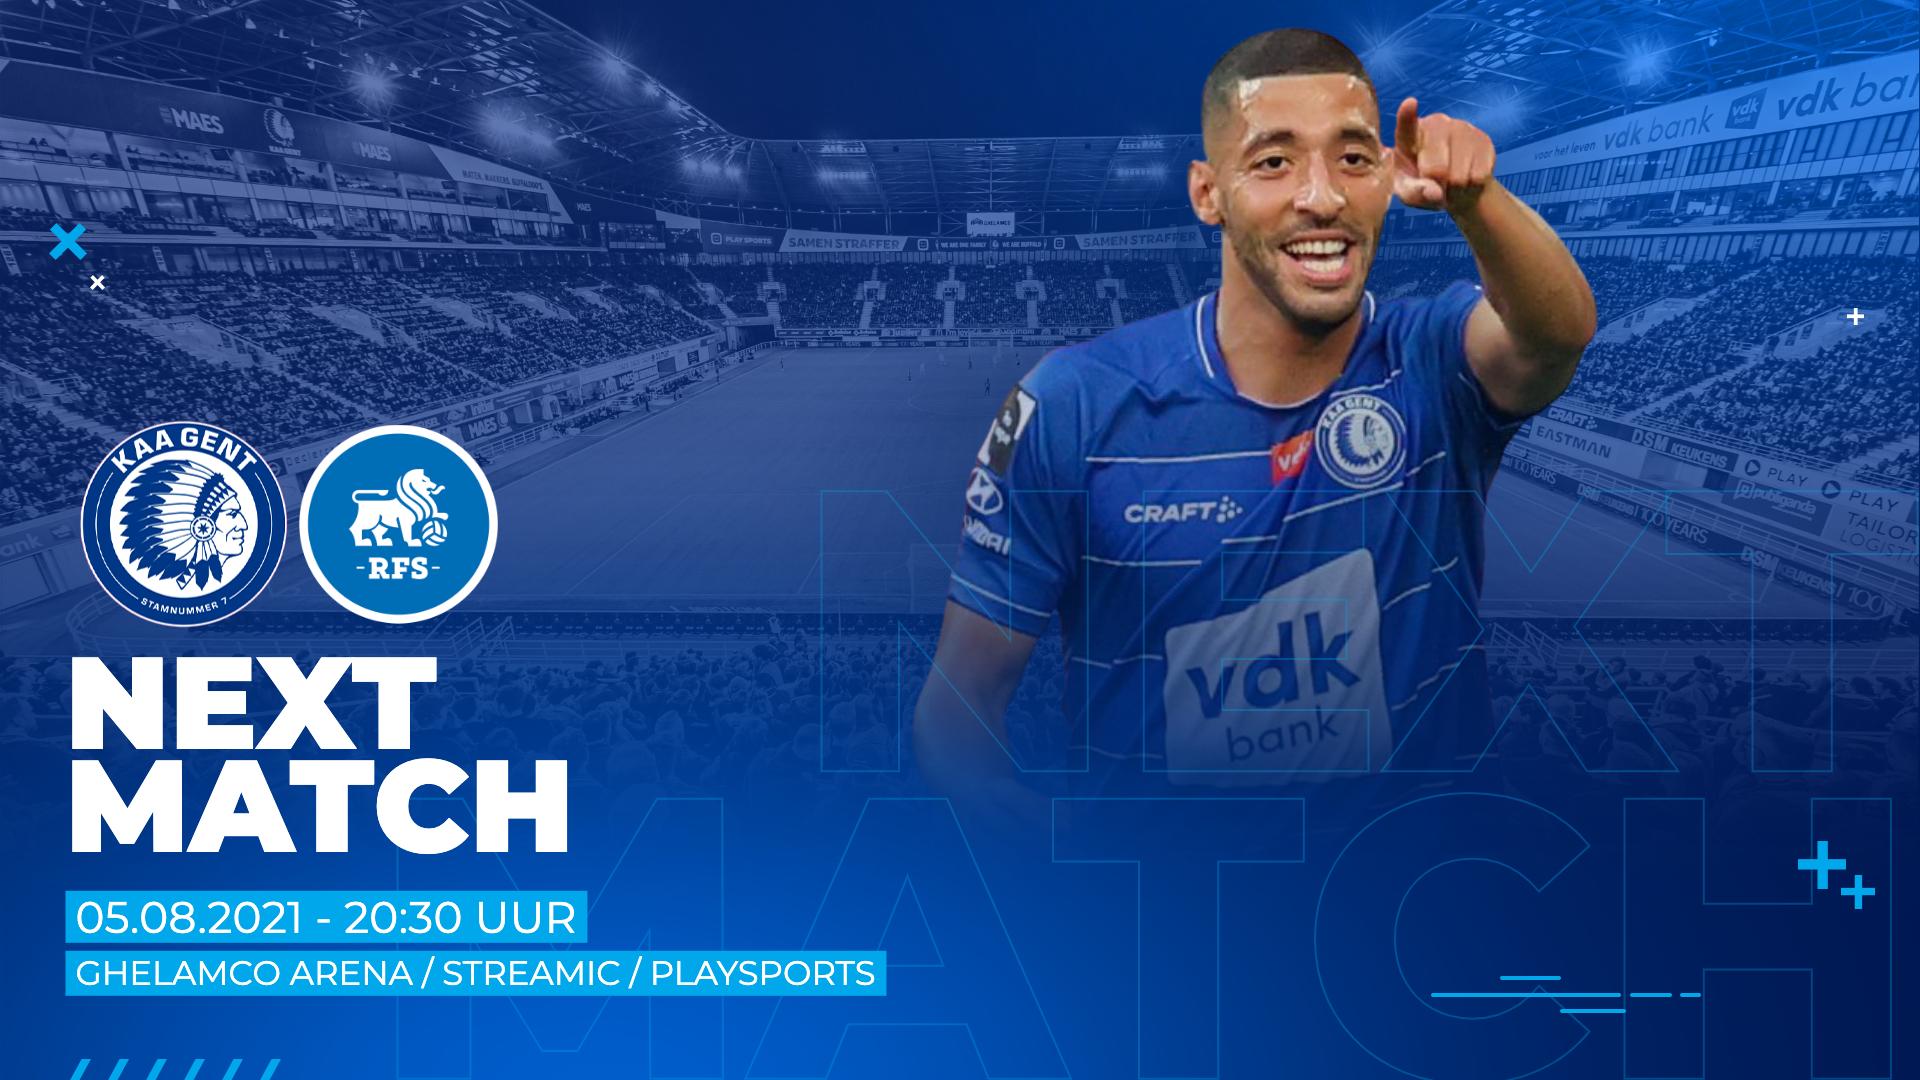 KAA Gent - FK RFS live te volgen via Streamic en PlaySports